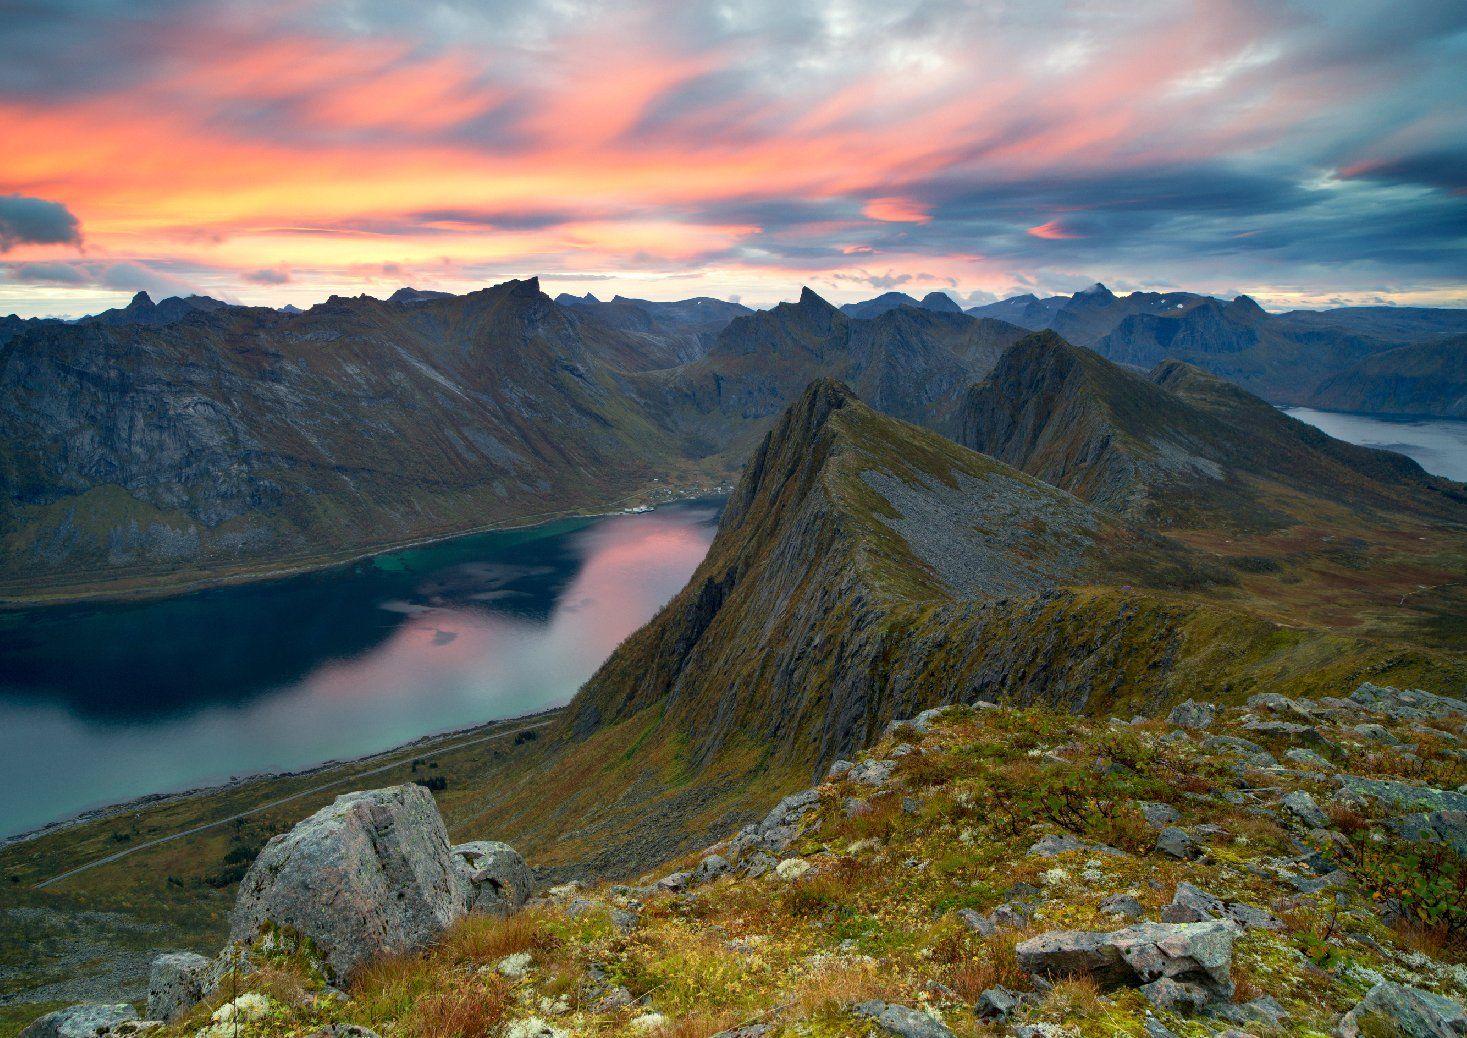 Husfjellet, Norway, Senja, Норвегия, Сергей Луканкин